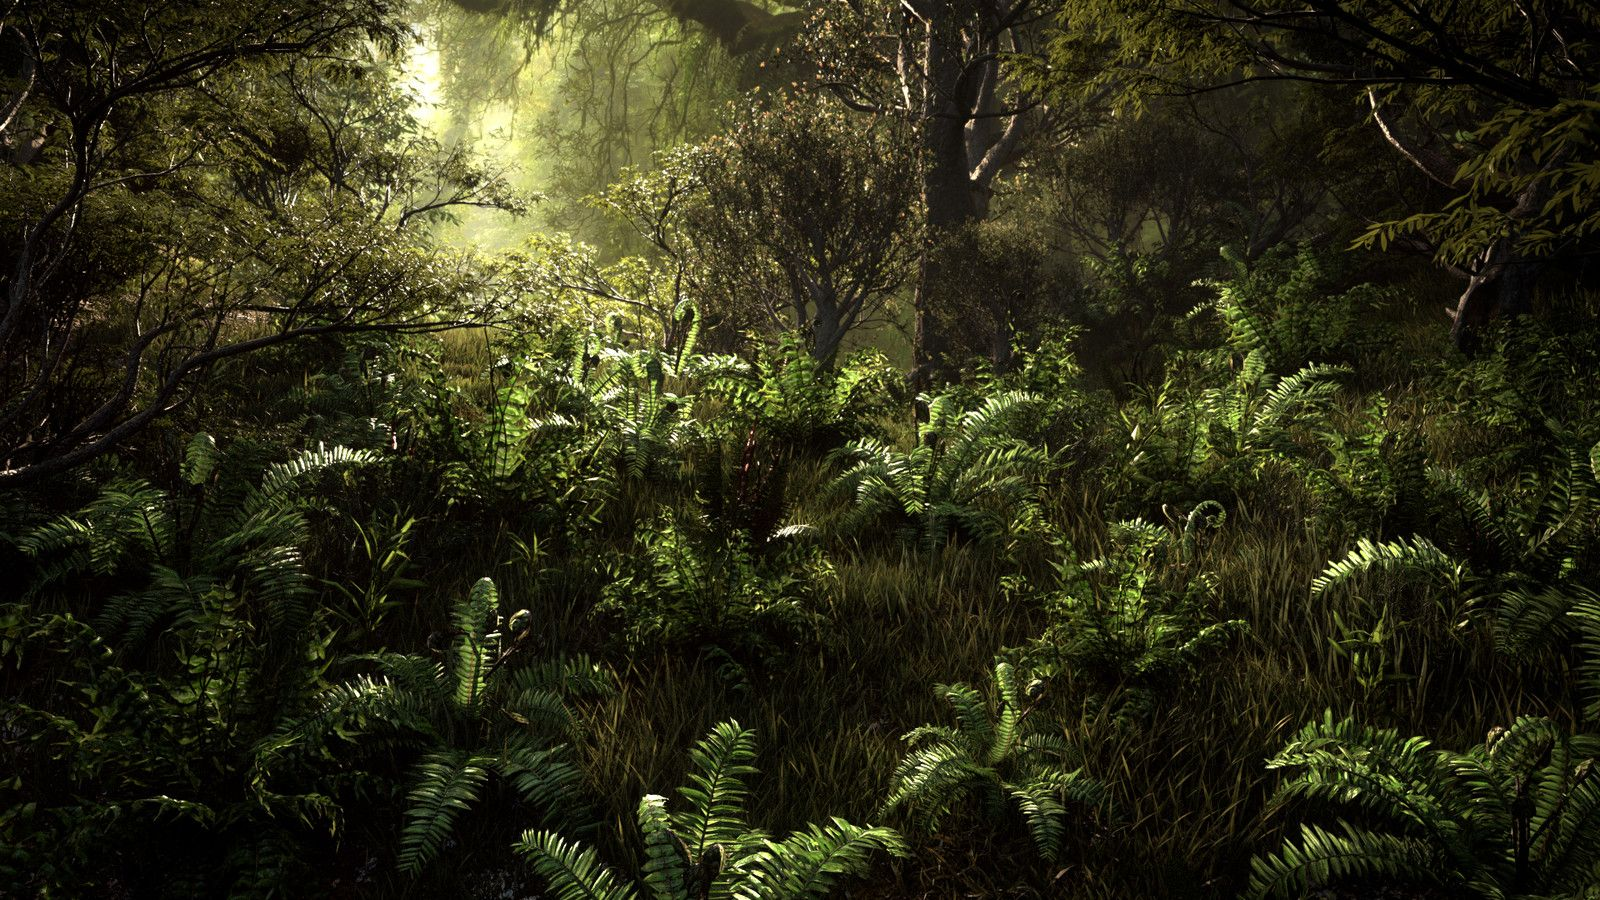 Wild Forest II, Greg Zdunek on ArtStation at https://www.artstation.com/artwork/q0yya